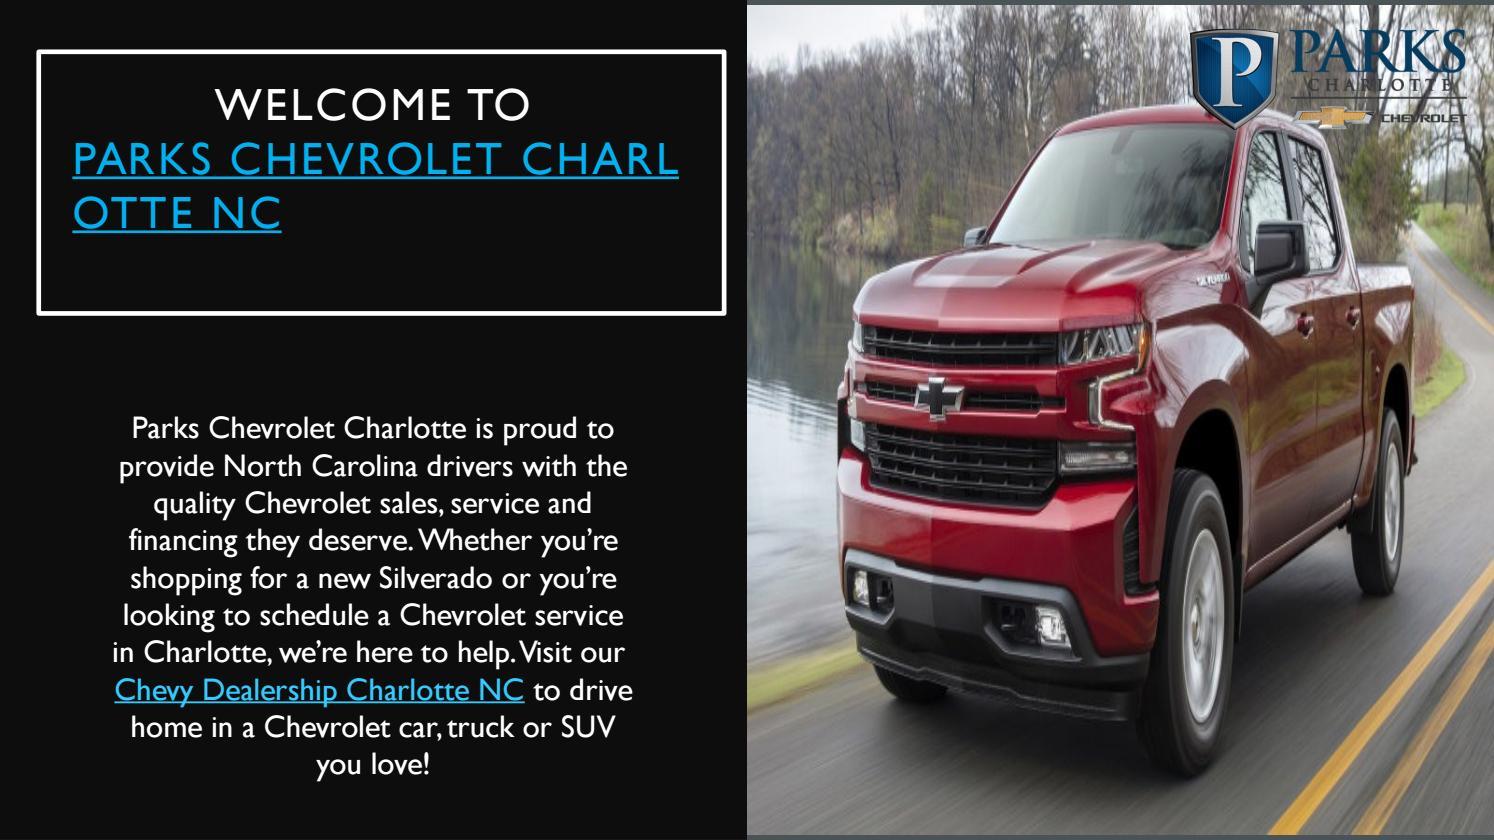 Chevrolet Dealership Charlotte Nc Chevrolet Charlotte Chevrolet Dealership Charlotte By Parks Chevrolet Charlotte Issuu